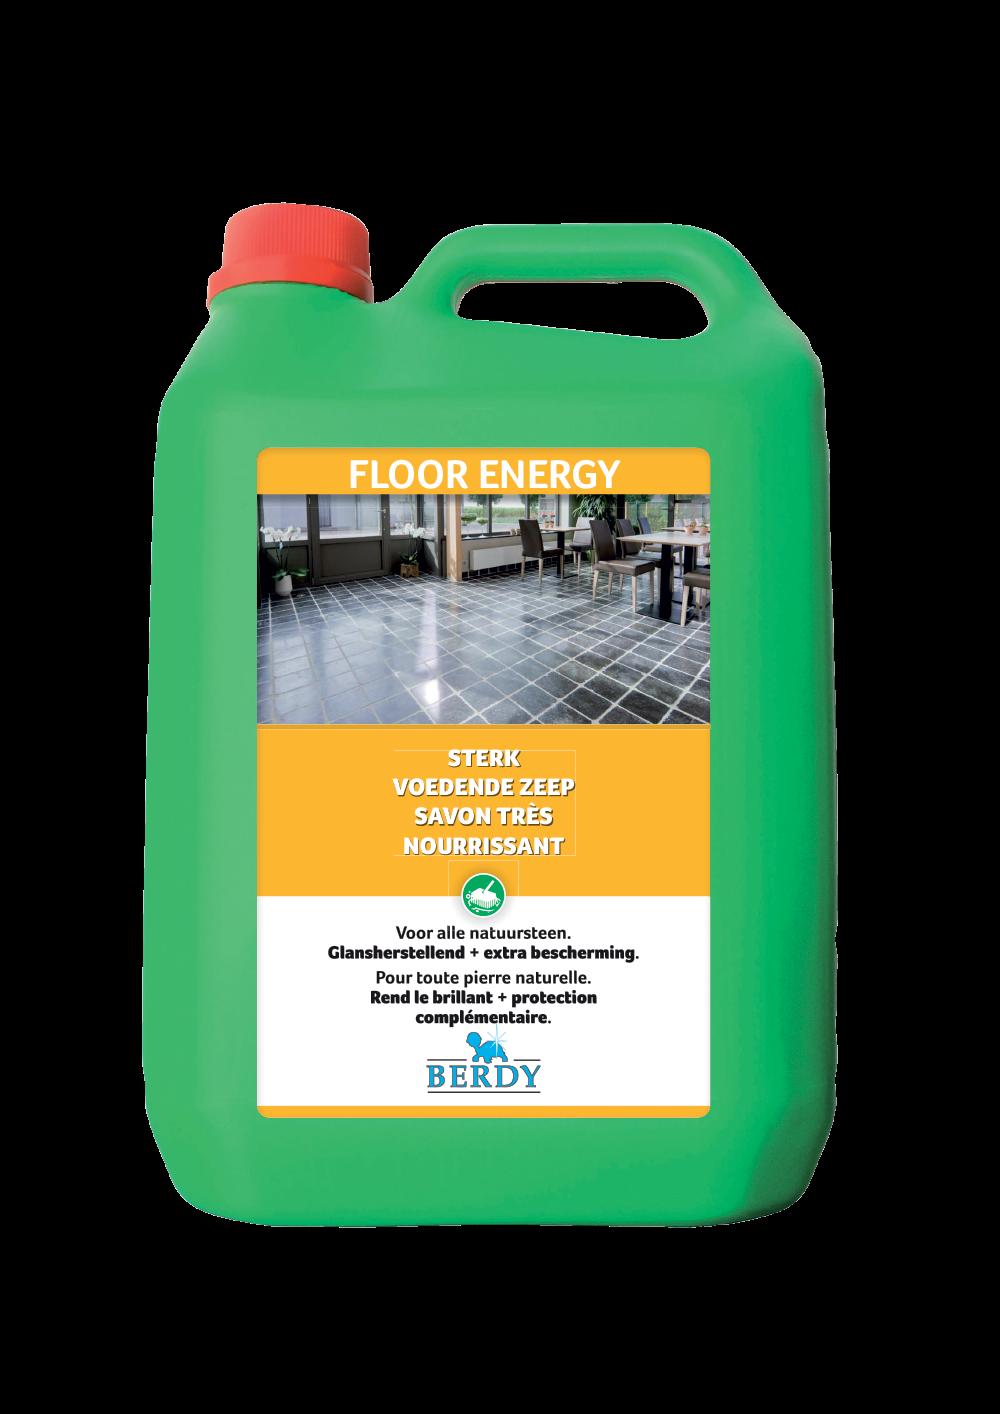 Berdy Natuursteen Floorenergy 5 L